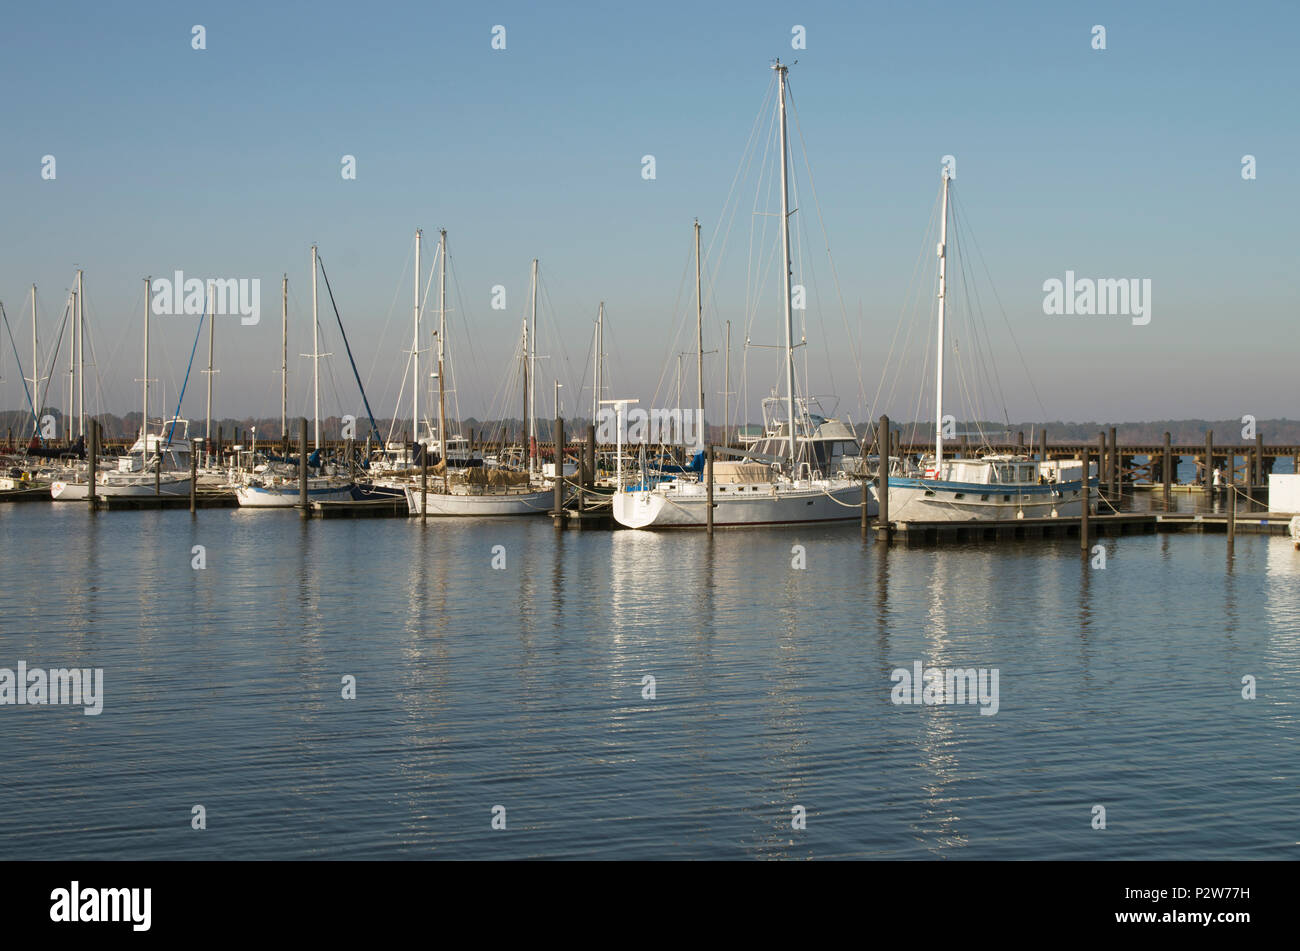 Boats are moored at the Bridgeton Marina on a sunny Sat. morning in November in Bridgeton ,North carolina - Stock Image